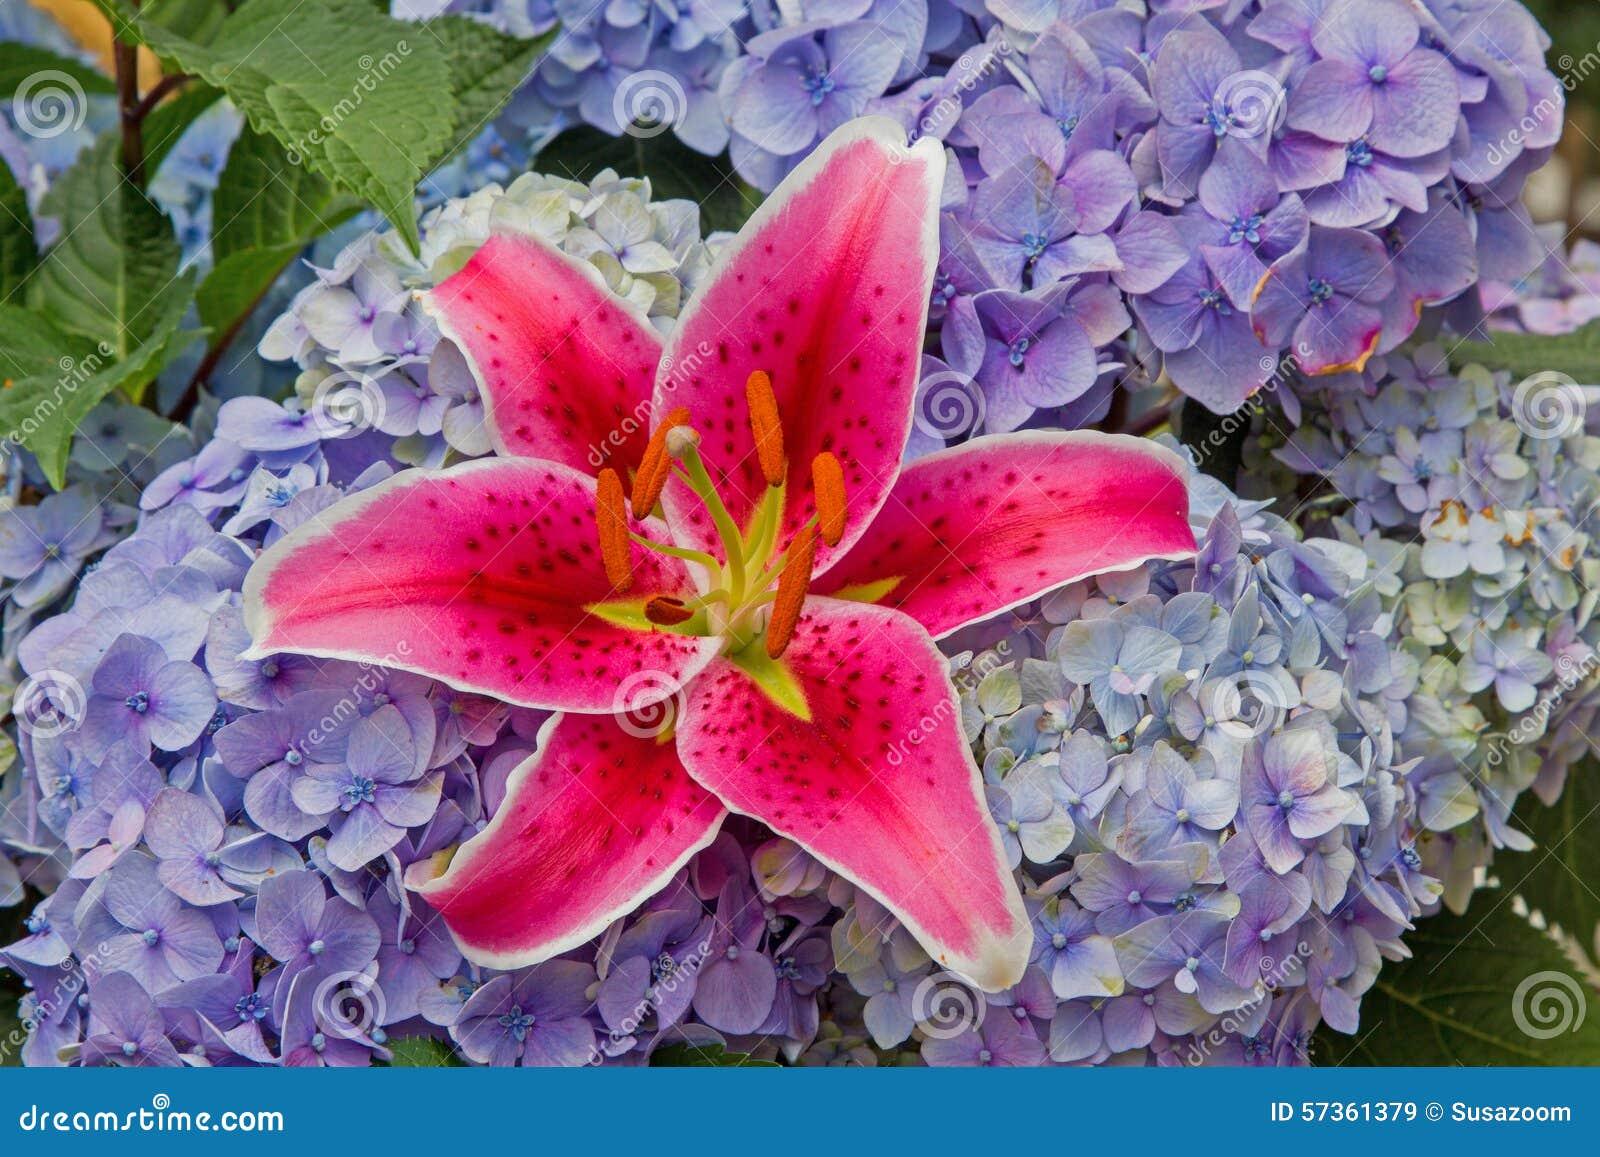 fleuridylle com